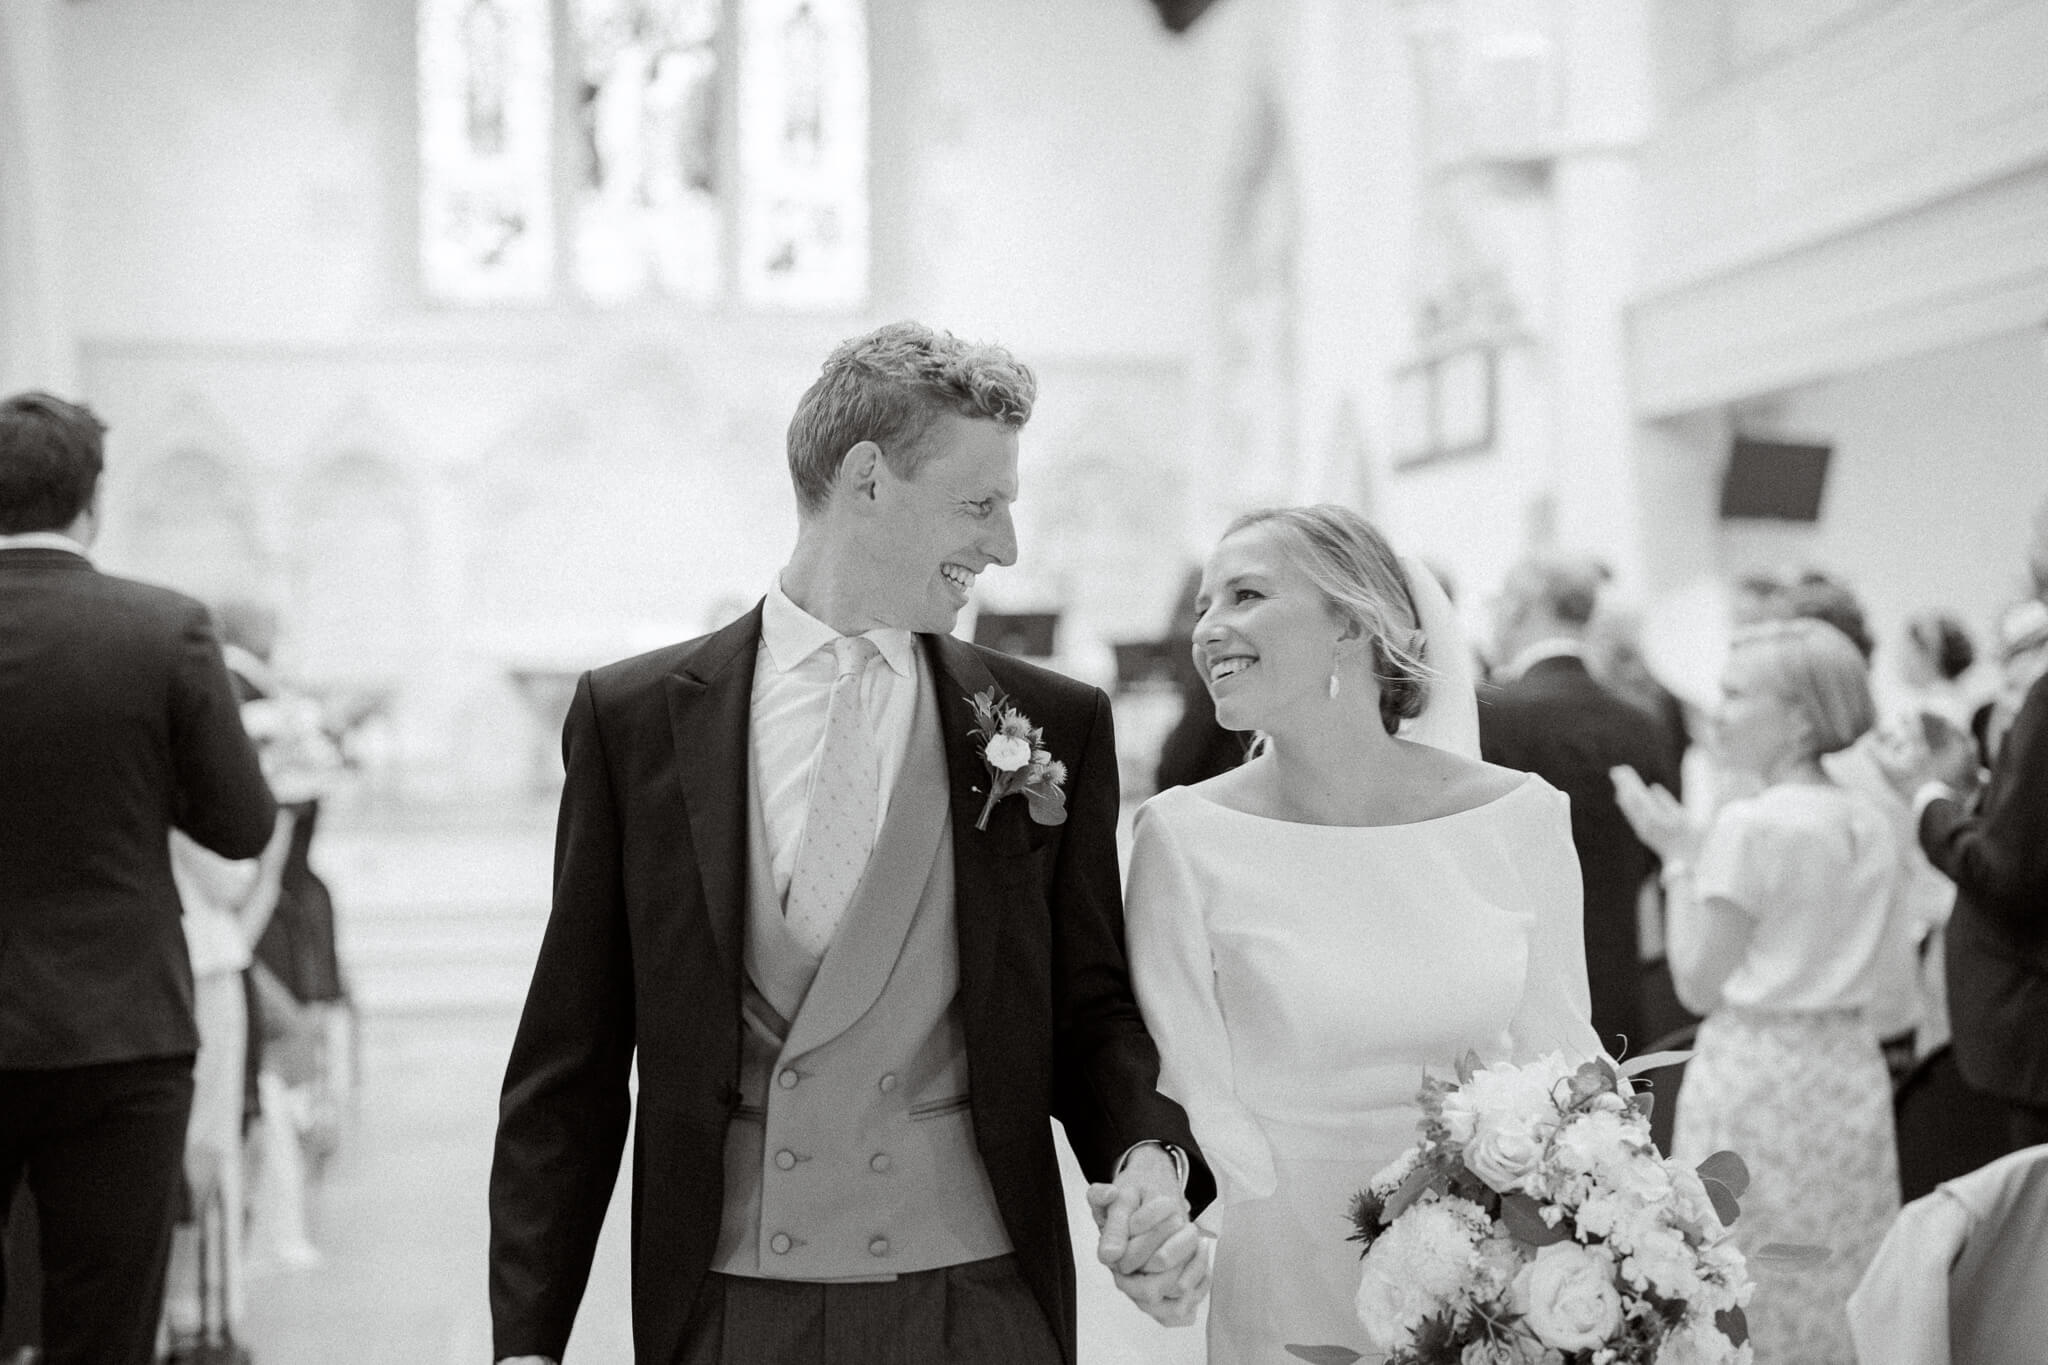 St Ebbs church wedding photography with couple